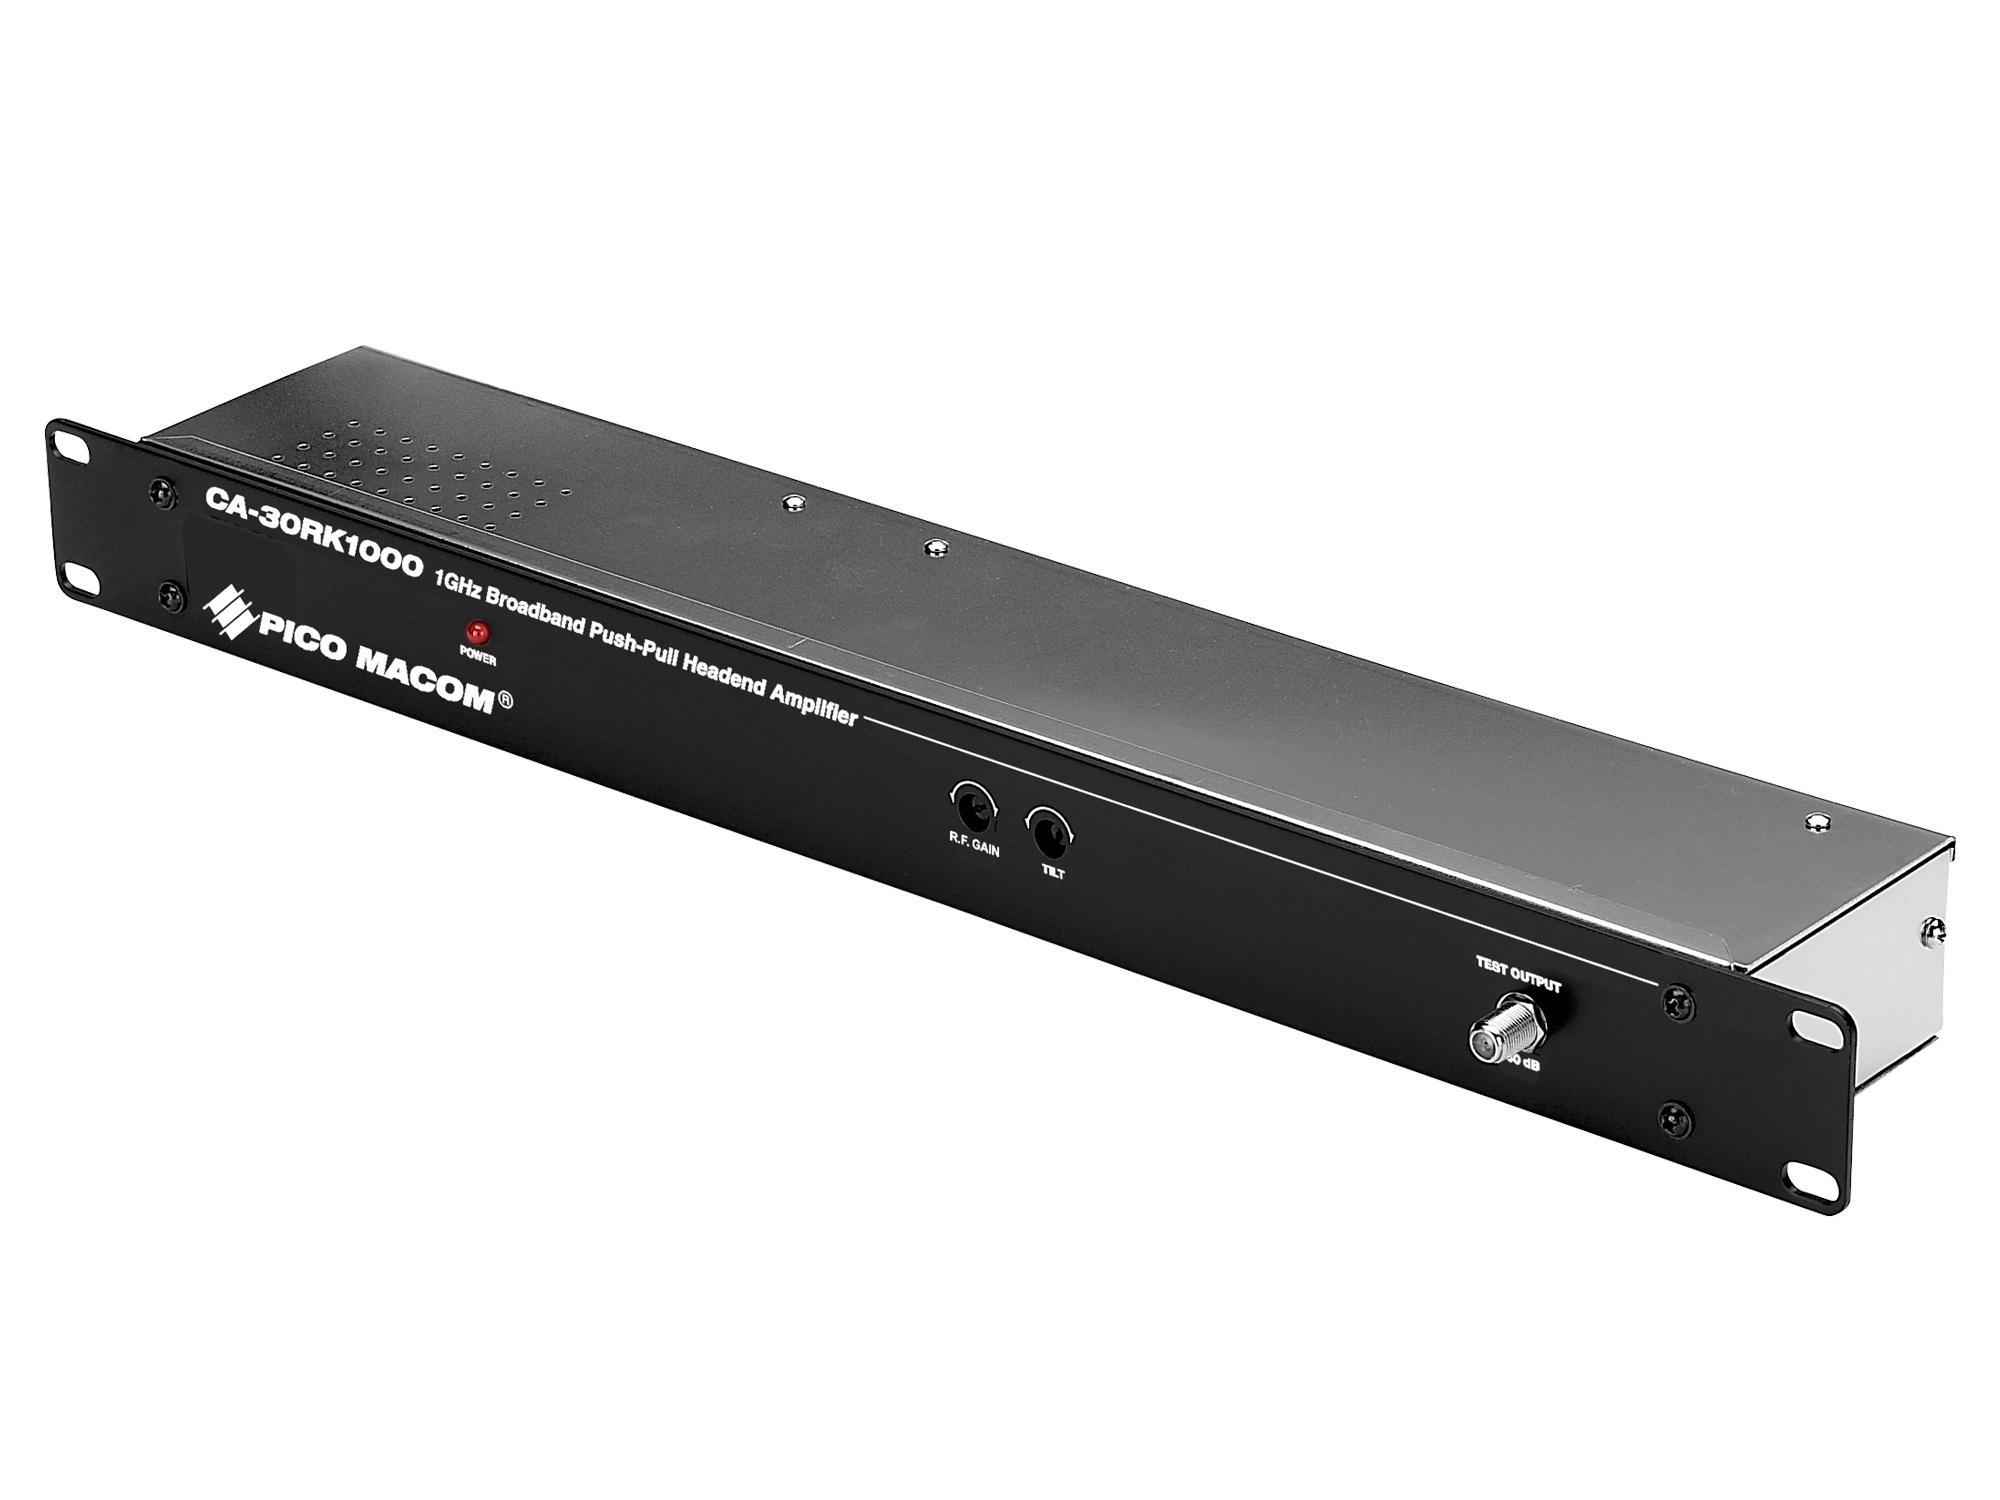 Pico Digital CA-30RK1000 1GHZ Rackmount Push Pull RF Amplifier